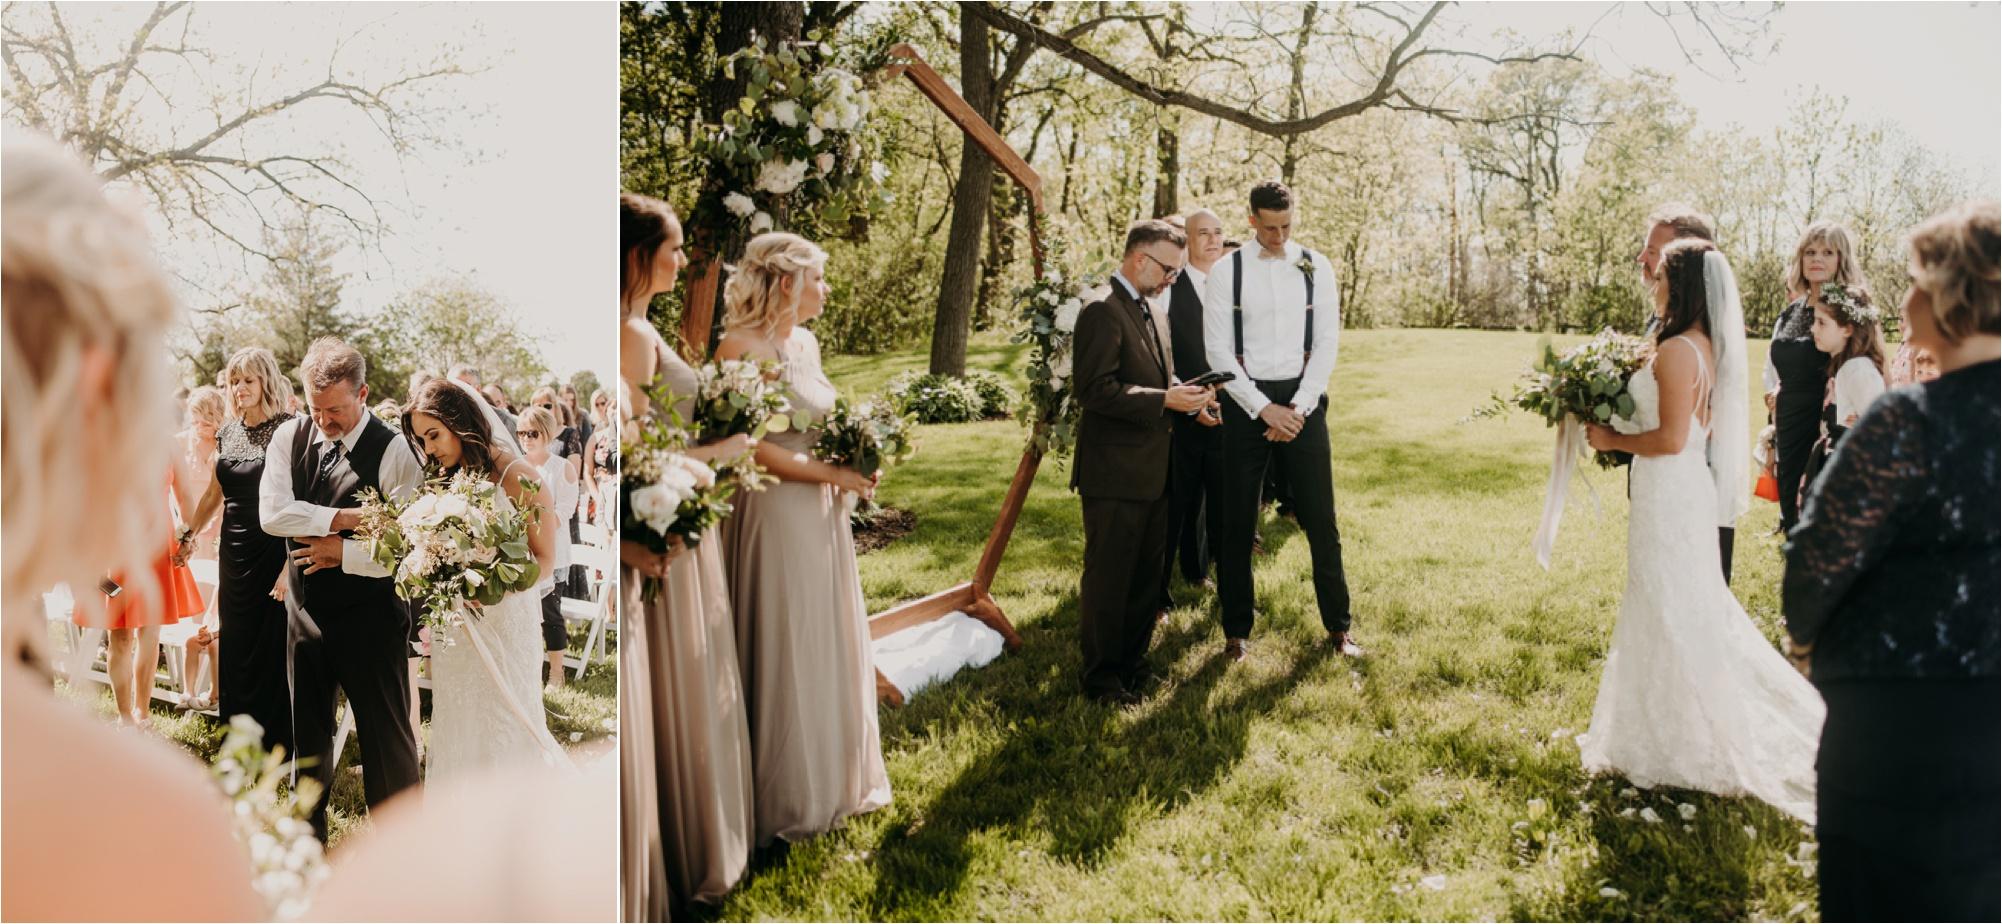 The Barn and Black Ridge Wedding Minneapolis Wedding Photographer_4141.jpg